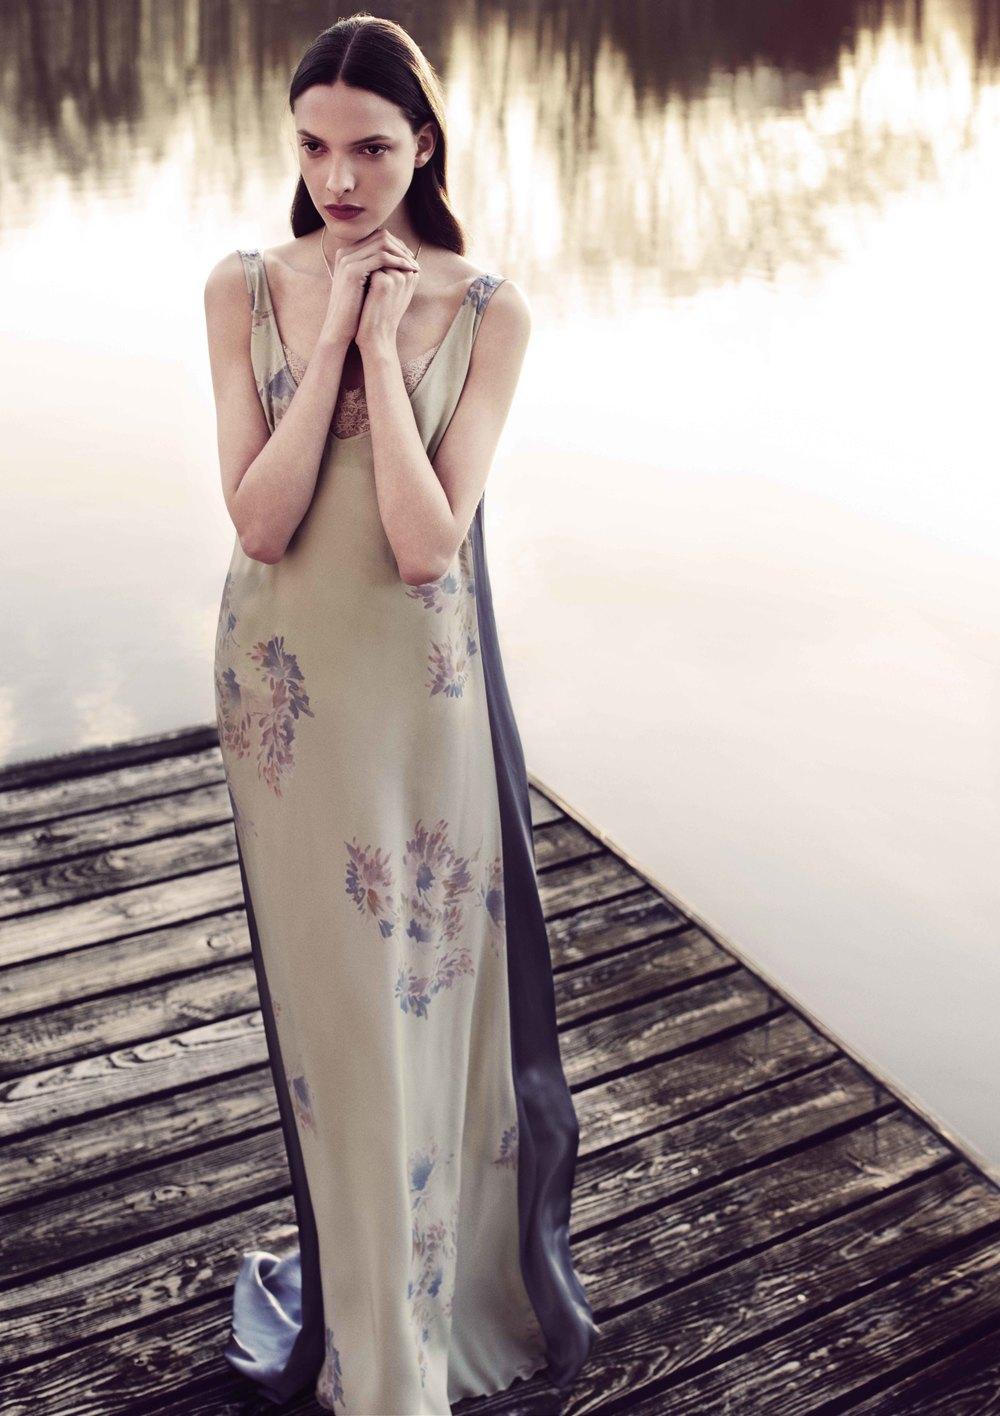 Dries Van Noten Dress Aubade Slip Susan Caplan Locket Necklace Stylist's Own Rabbit Ring